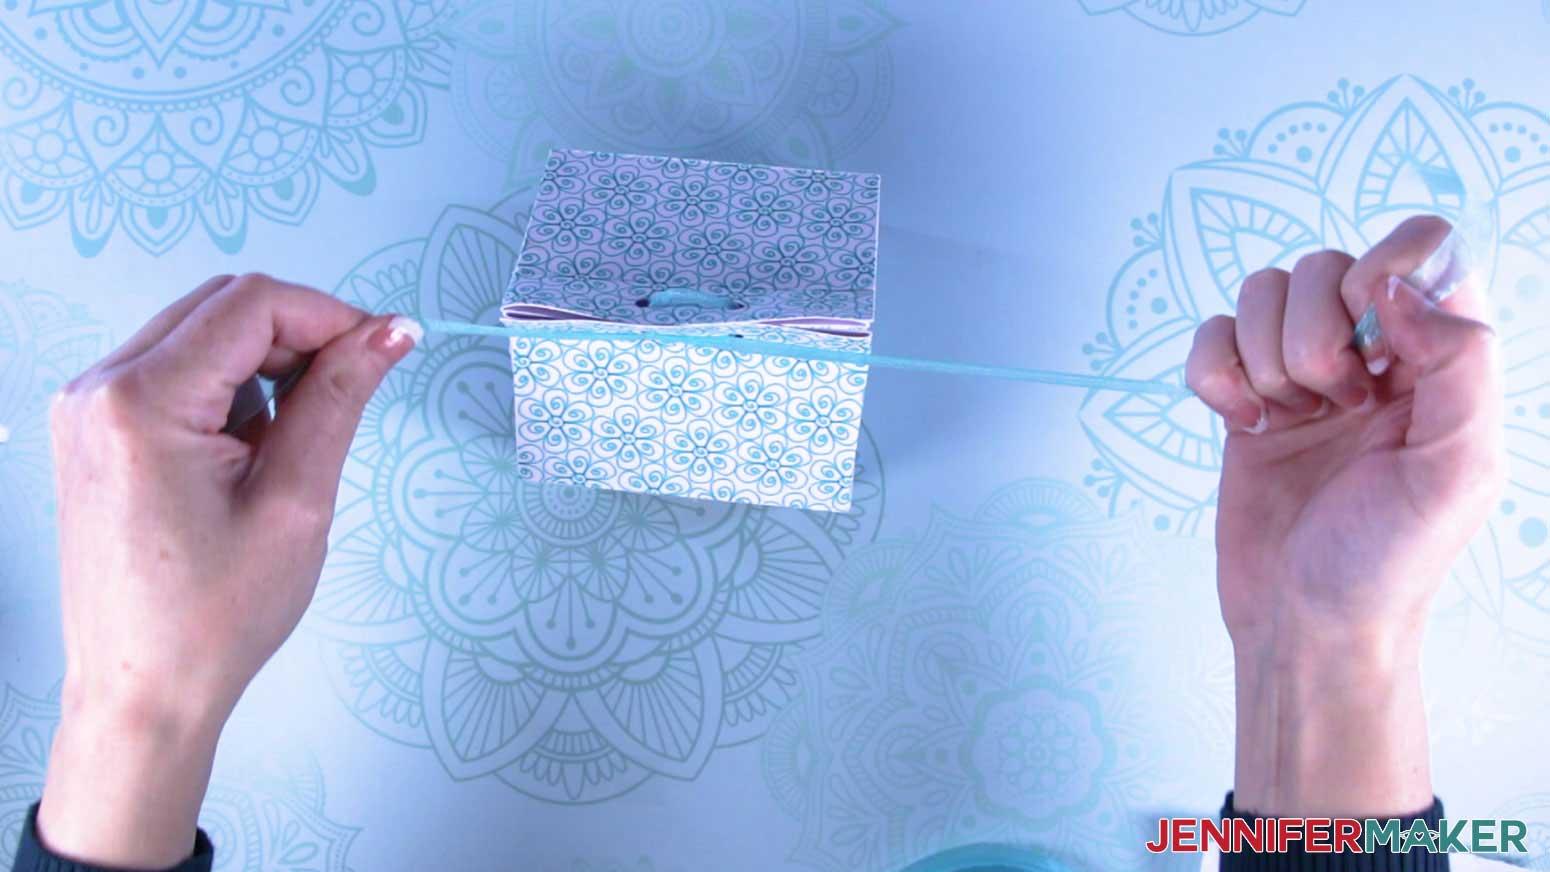 Tie ribbon to close the milk carton mug gift boxes